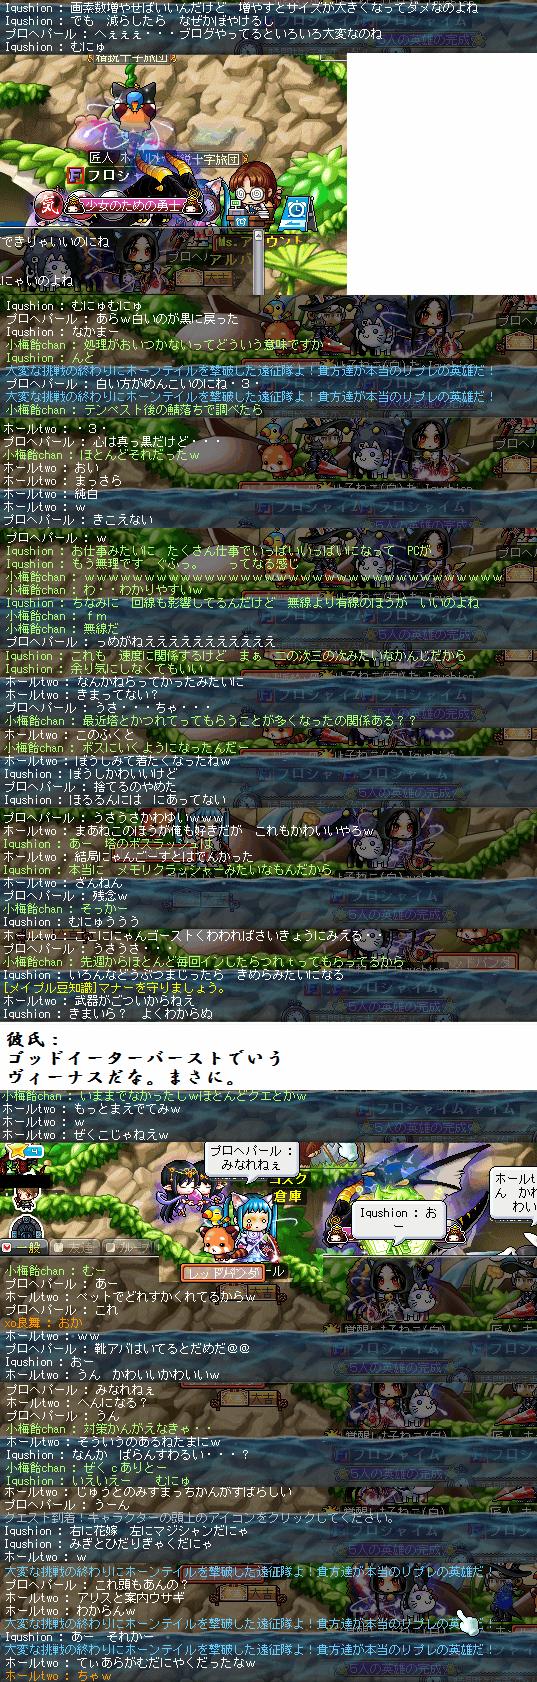 2013_0415_2232 _2